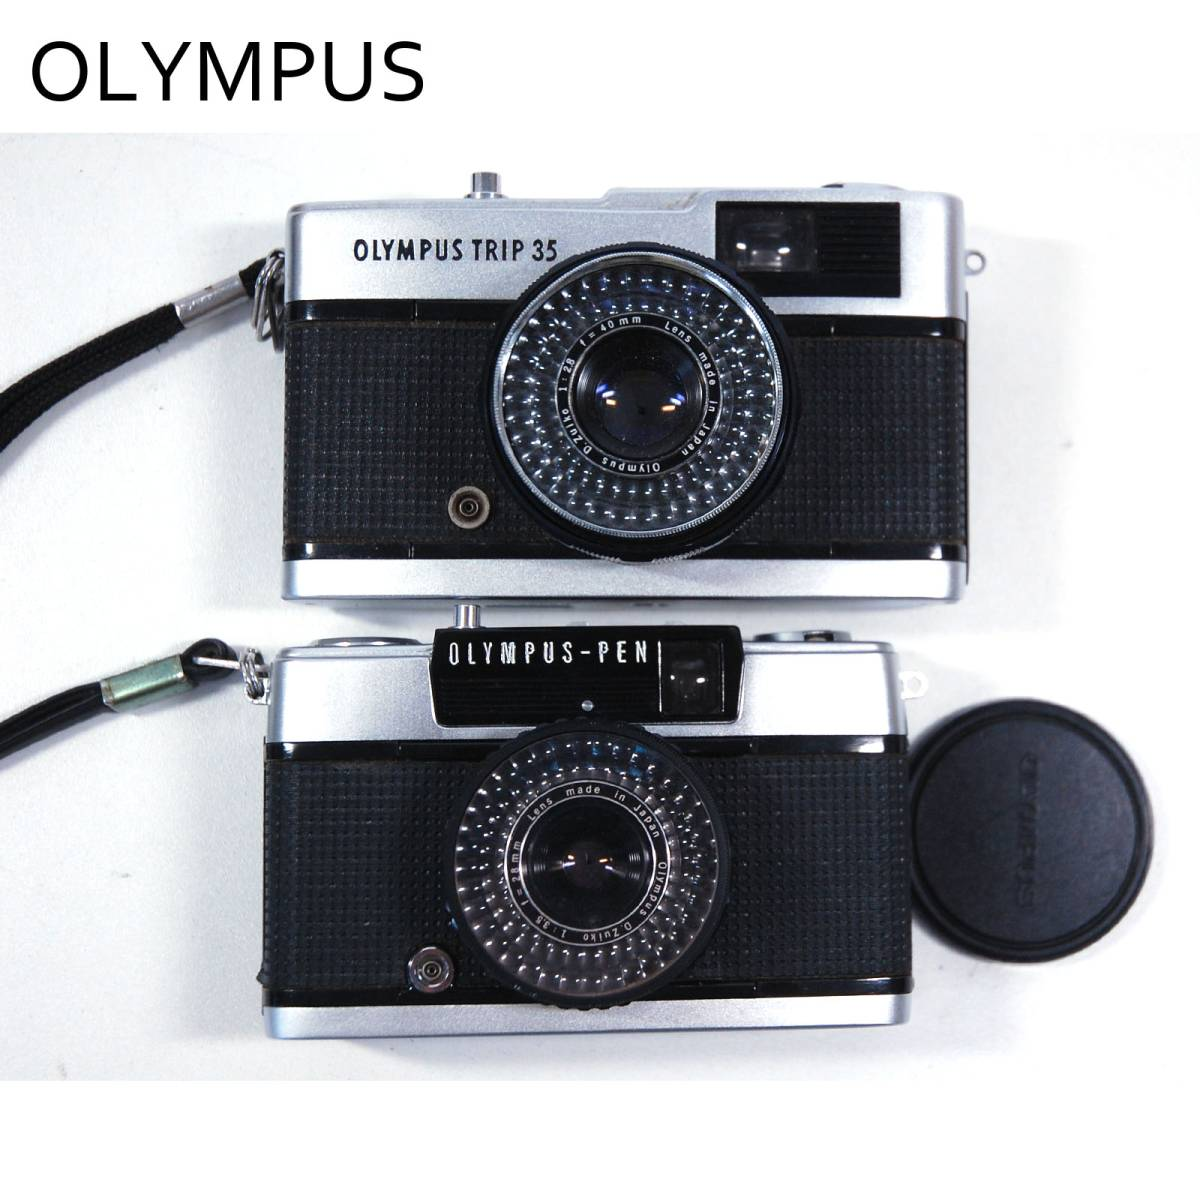 ☆【OLYMPUS】オリンパス TRIP 35 D.Zuiko 1:2.8 F=40mm おまけカメラ付き☆H